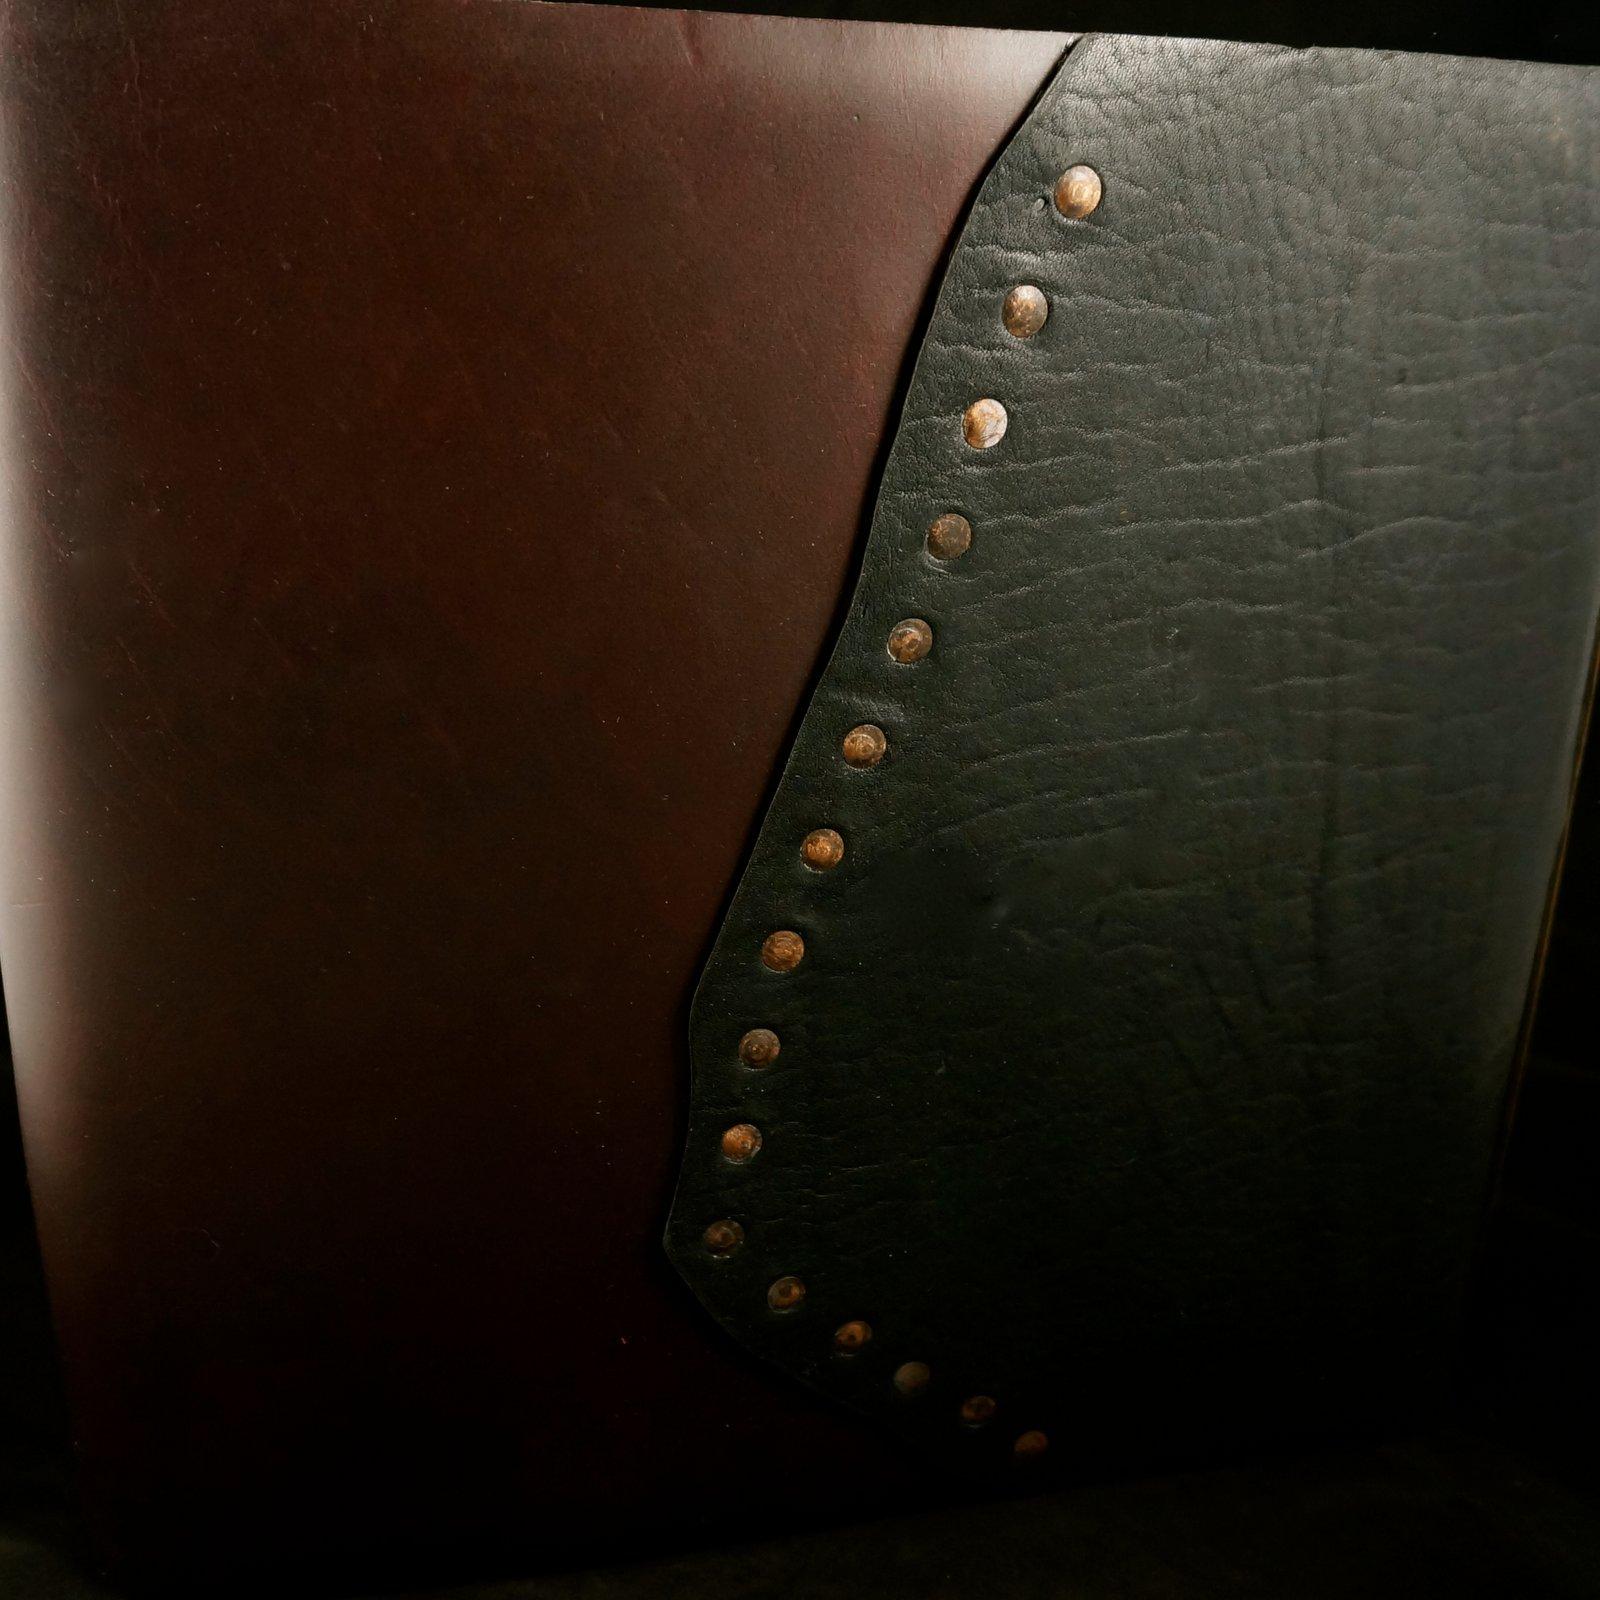 1600x1600 Iona Handcrafted Books Store La Abuela! Blackwine 2toned